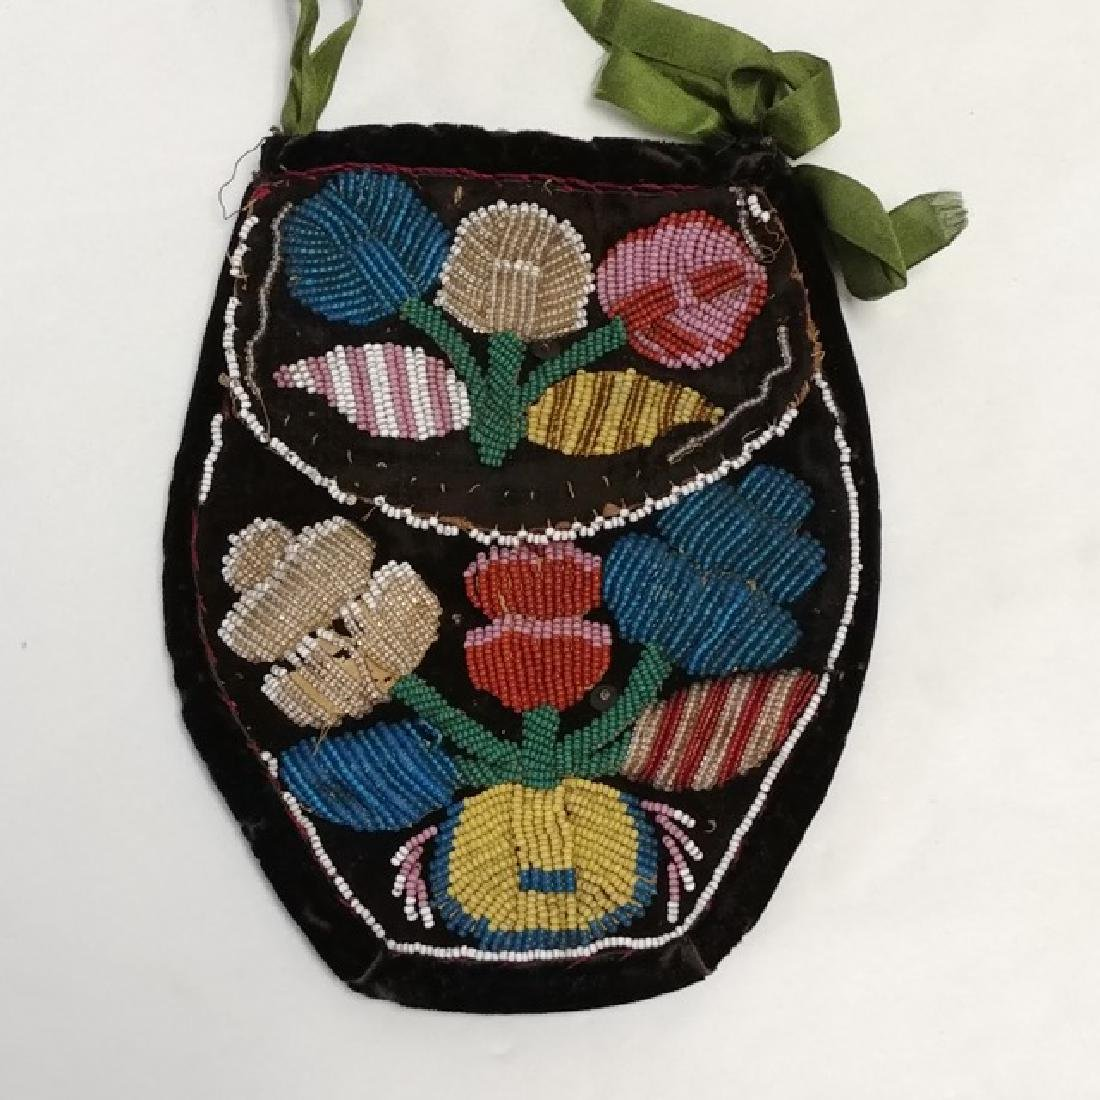 Antique Iroquois Beaded Pouch on Velvet - 2